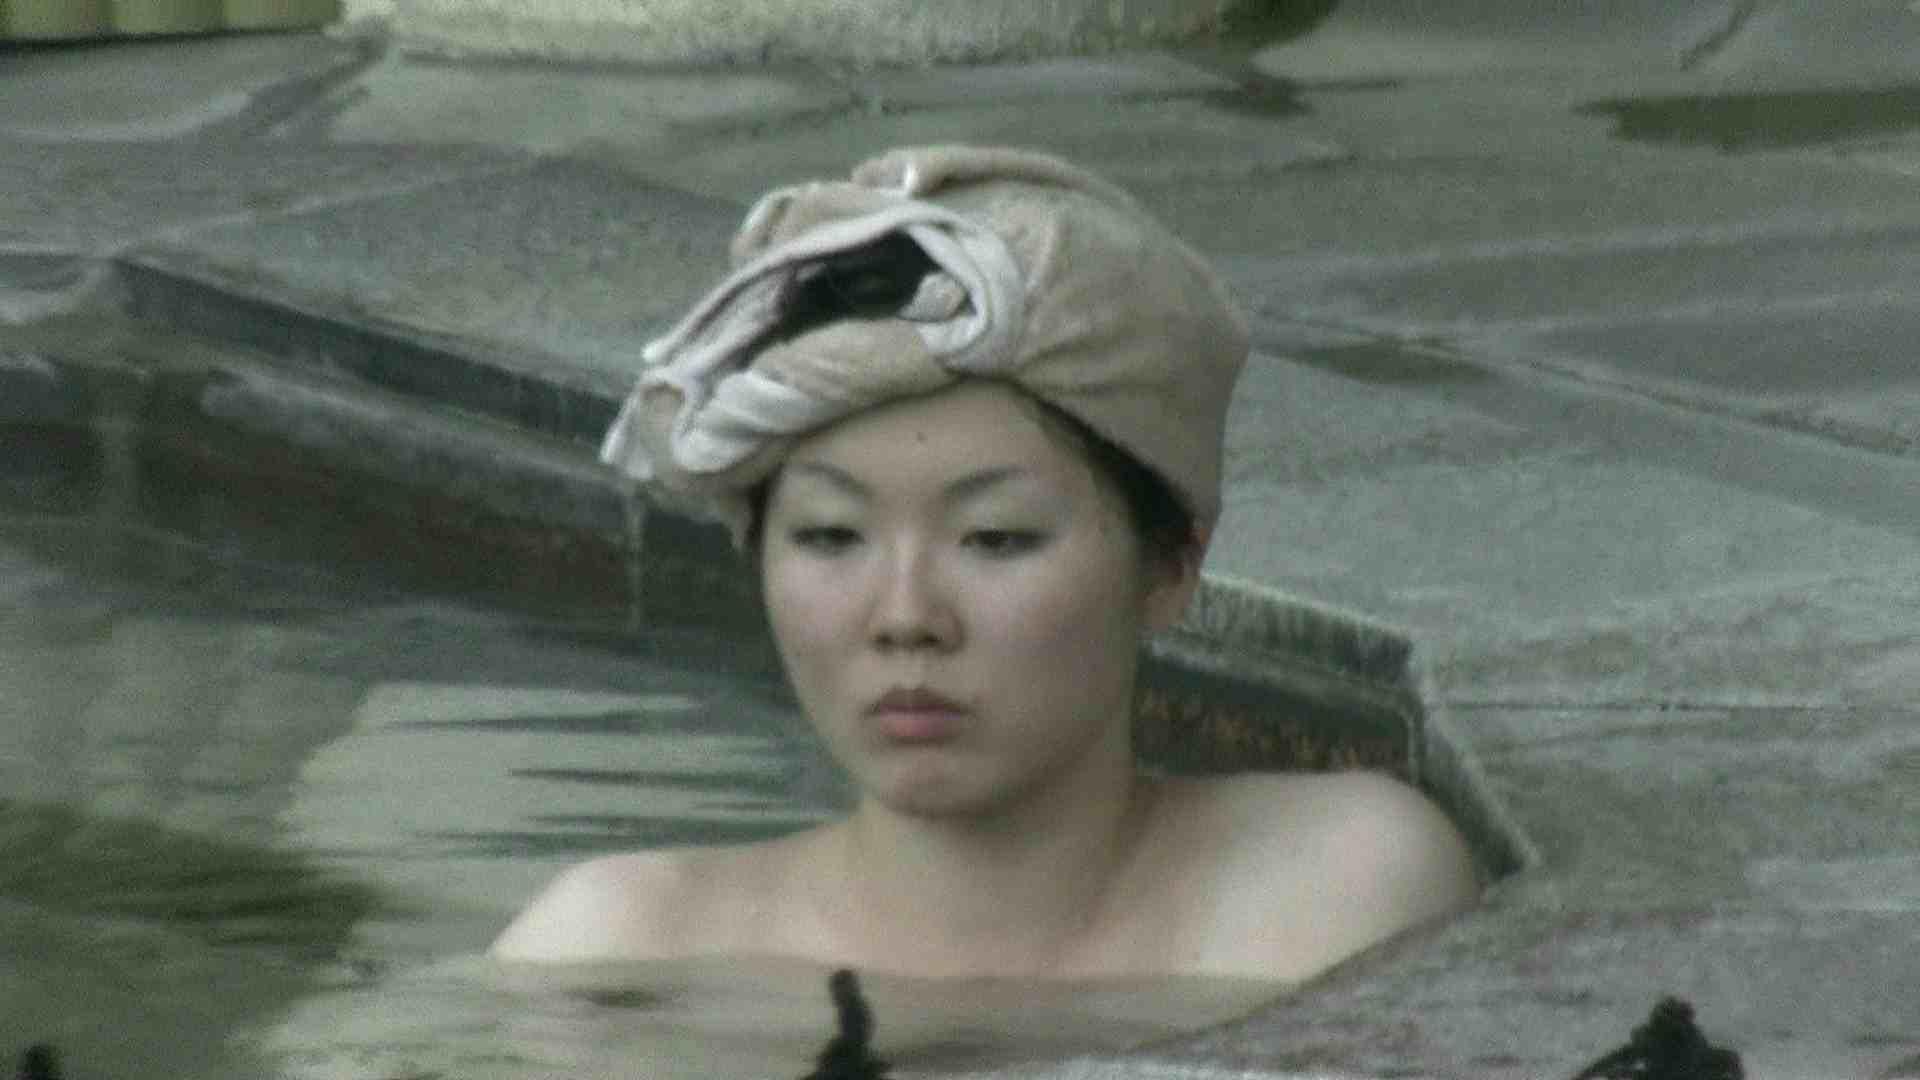 Aquaな露天風呂Vol.191 露天 | OL女体  72連発 64